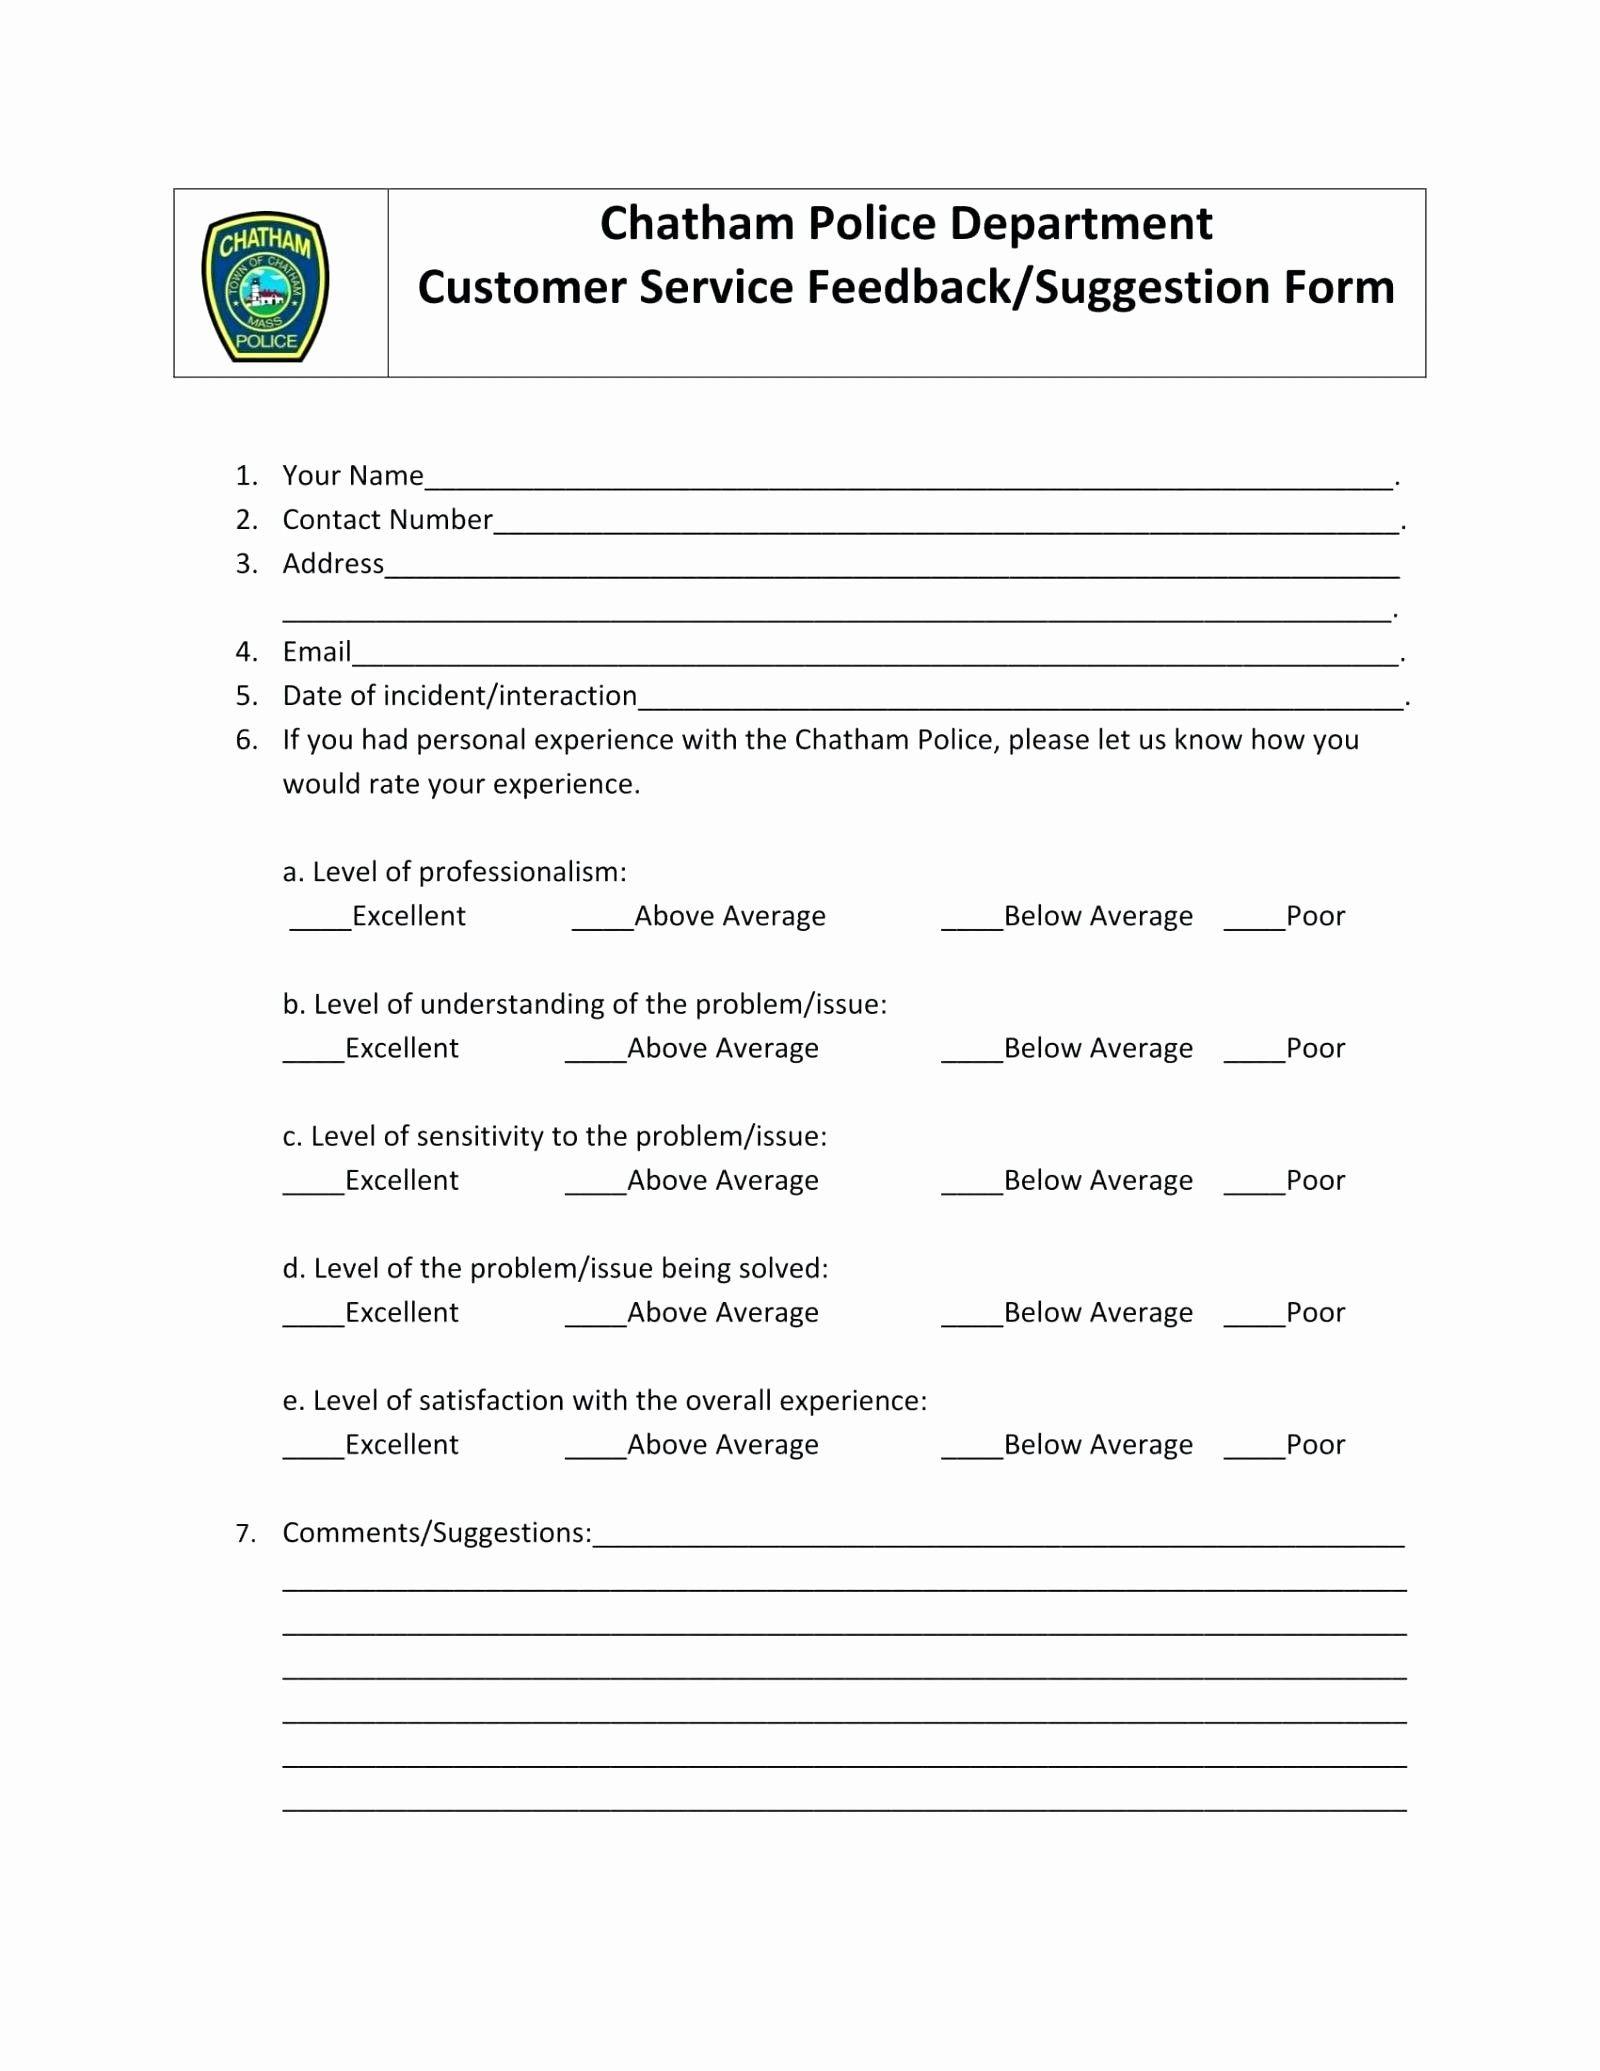 Customer Feedback Form Template Word Luxury Template Customer Service Feedback Template Resume Template Word Data Visualization Tools Words Customer feedback form template word